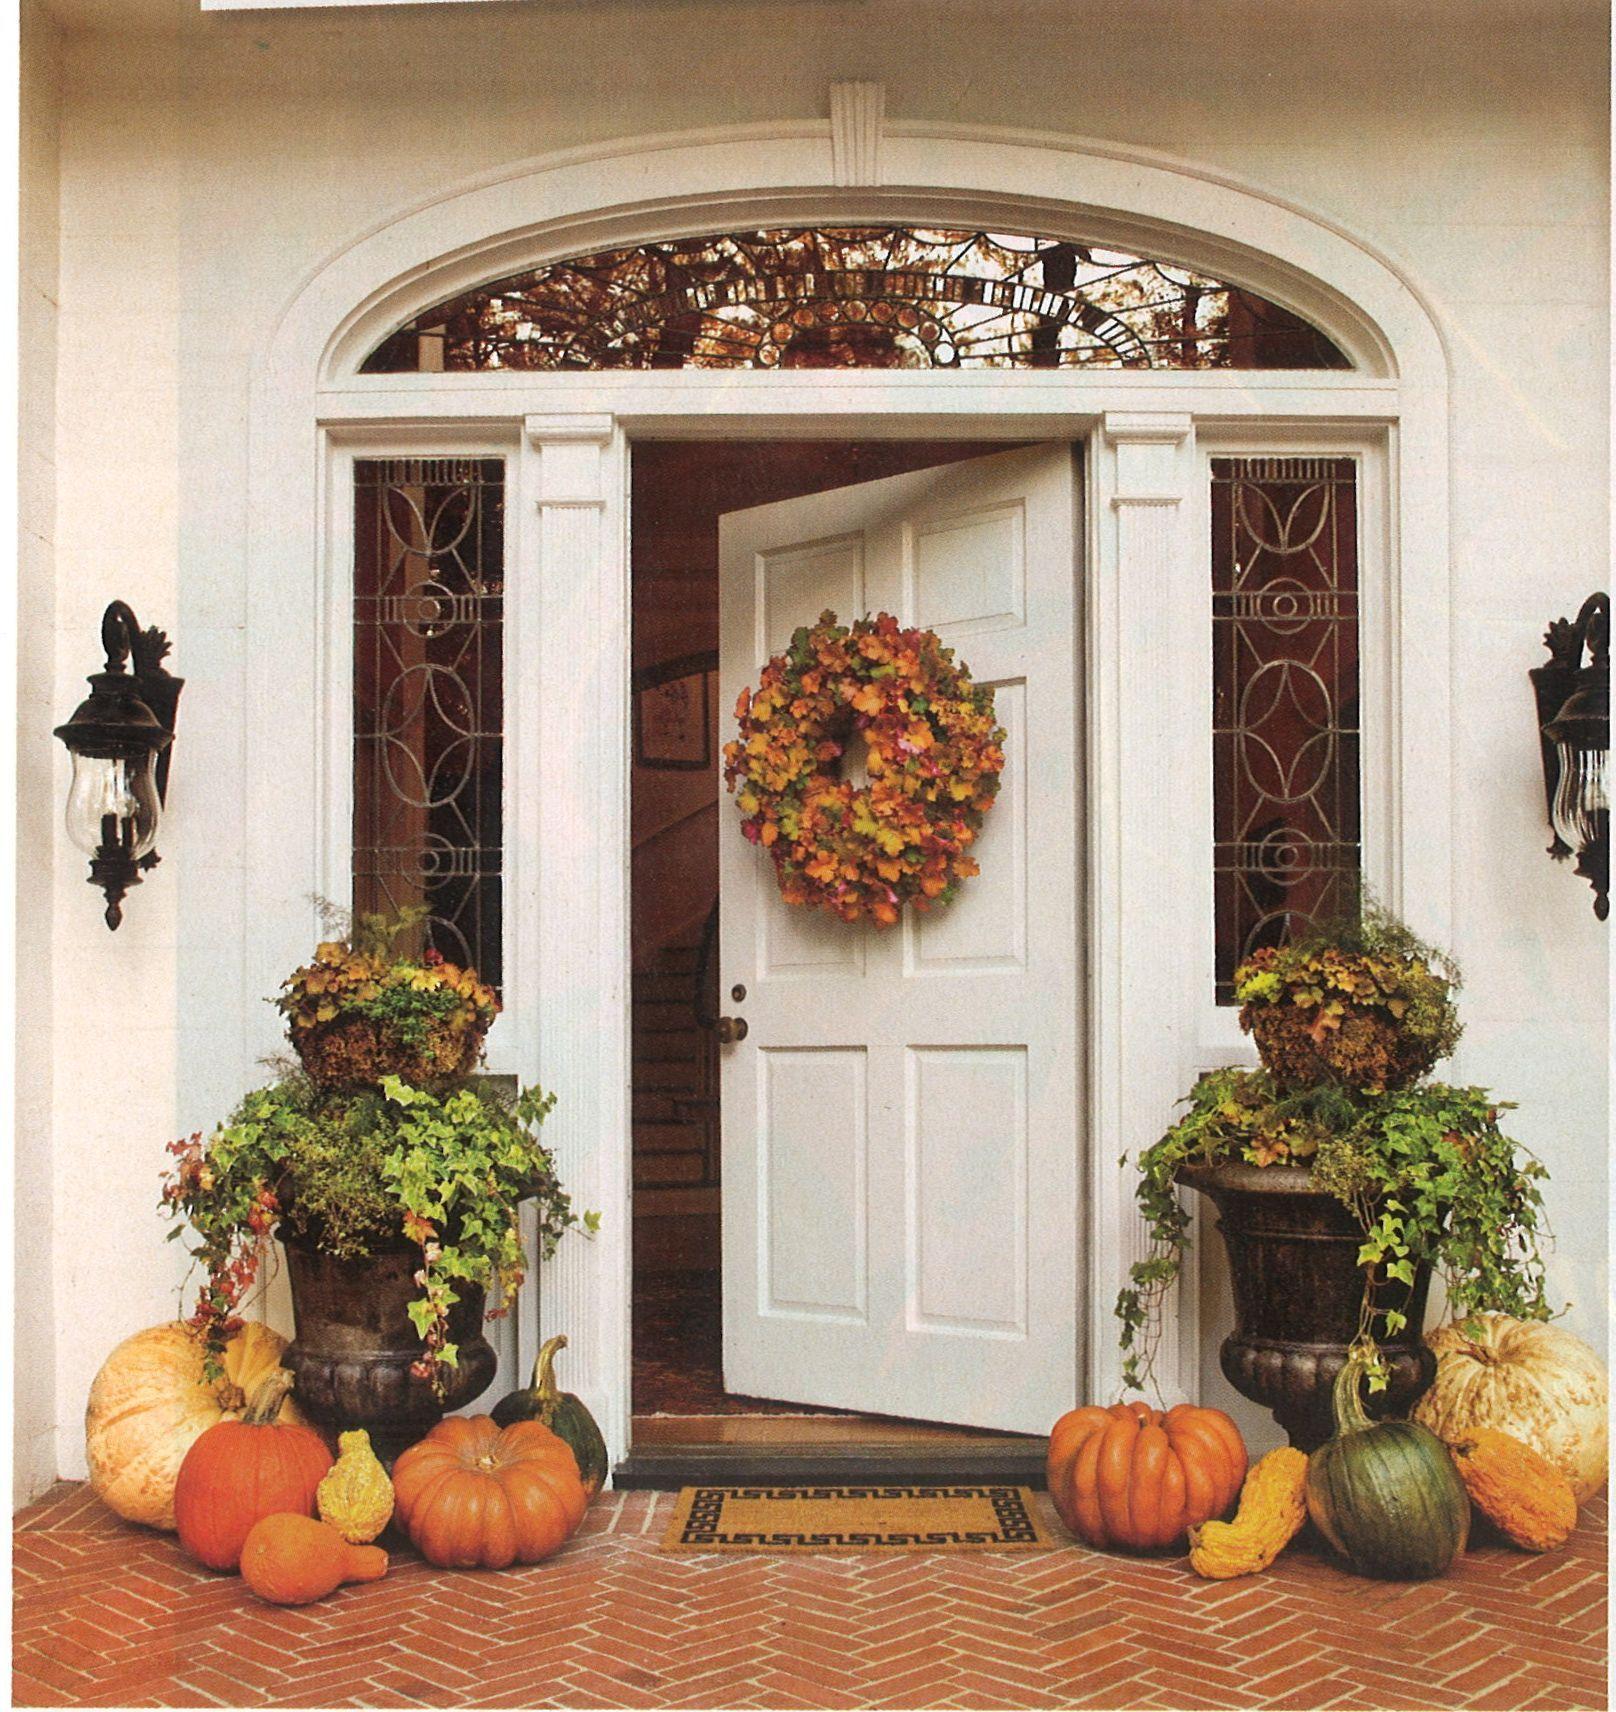 Hgtv Front Door Fall Decorations: Fall Decor Front Door Pumpkins